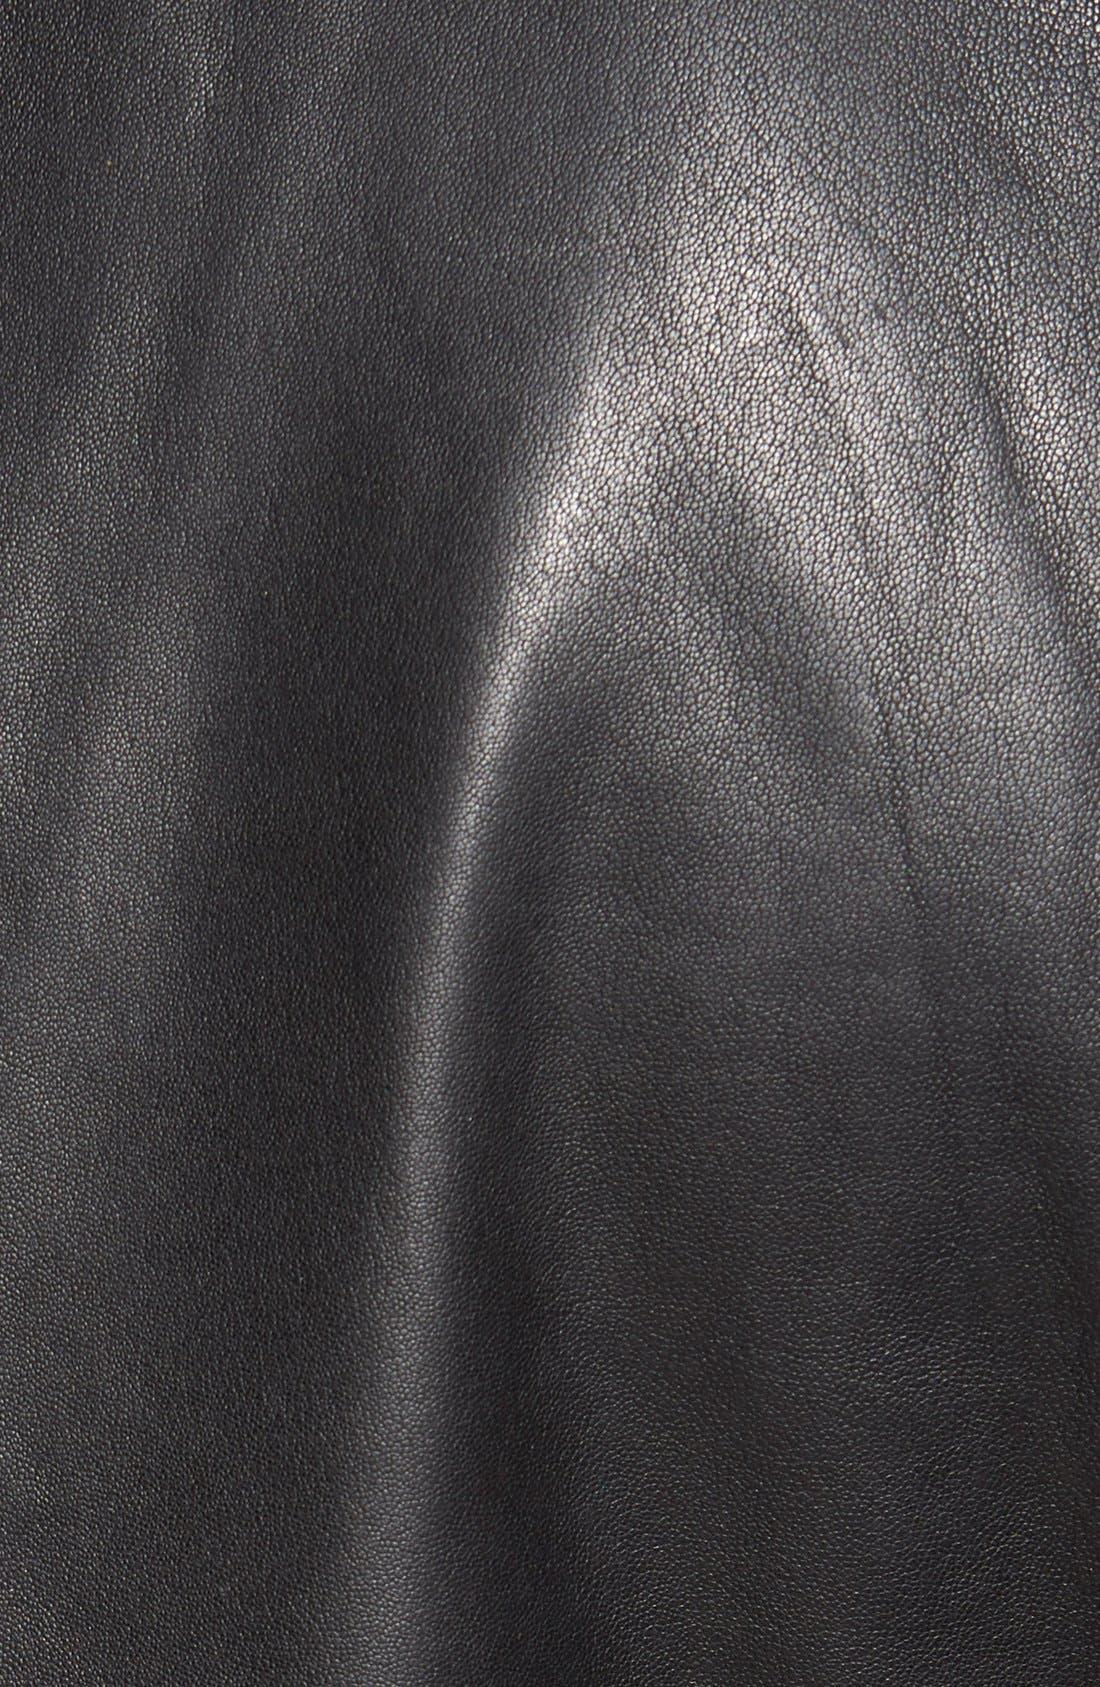 Lambskin Leather Sport Coat,                             Alternate thumbnail 5, color,                             BLACK